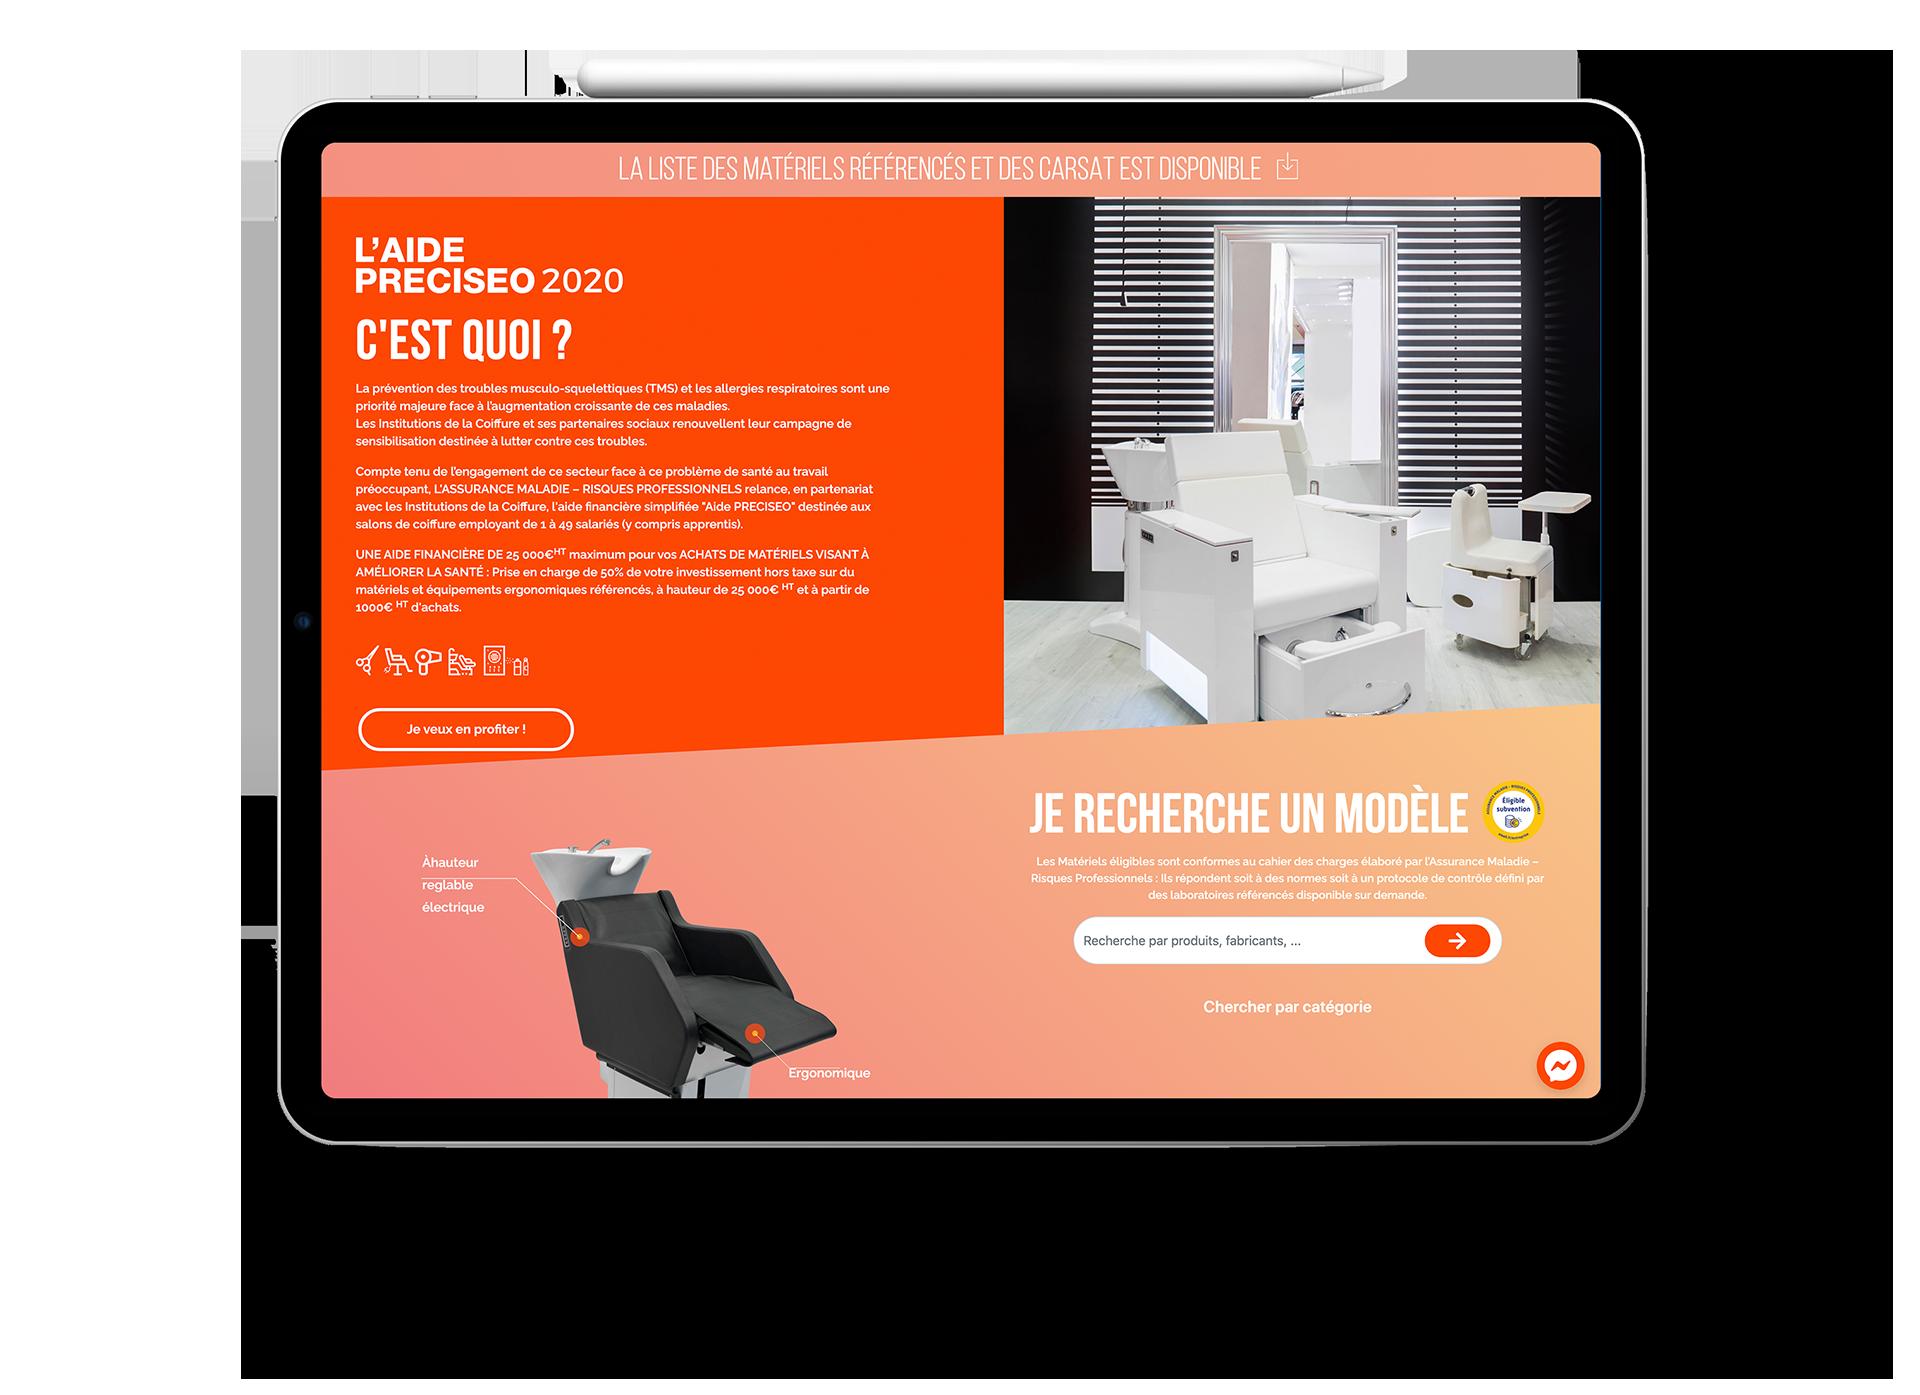 mock-up2-tablette-agence-conseil-en-communication-Letb-synergie